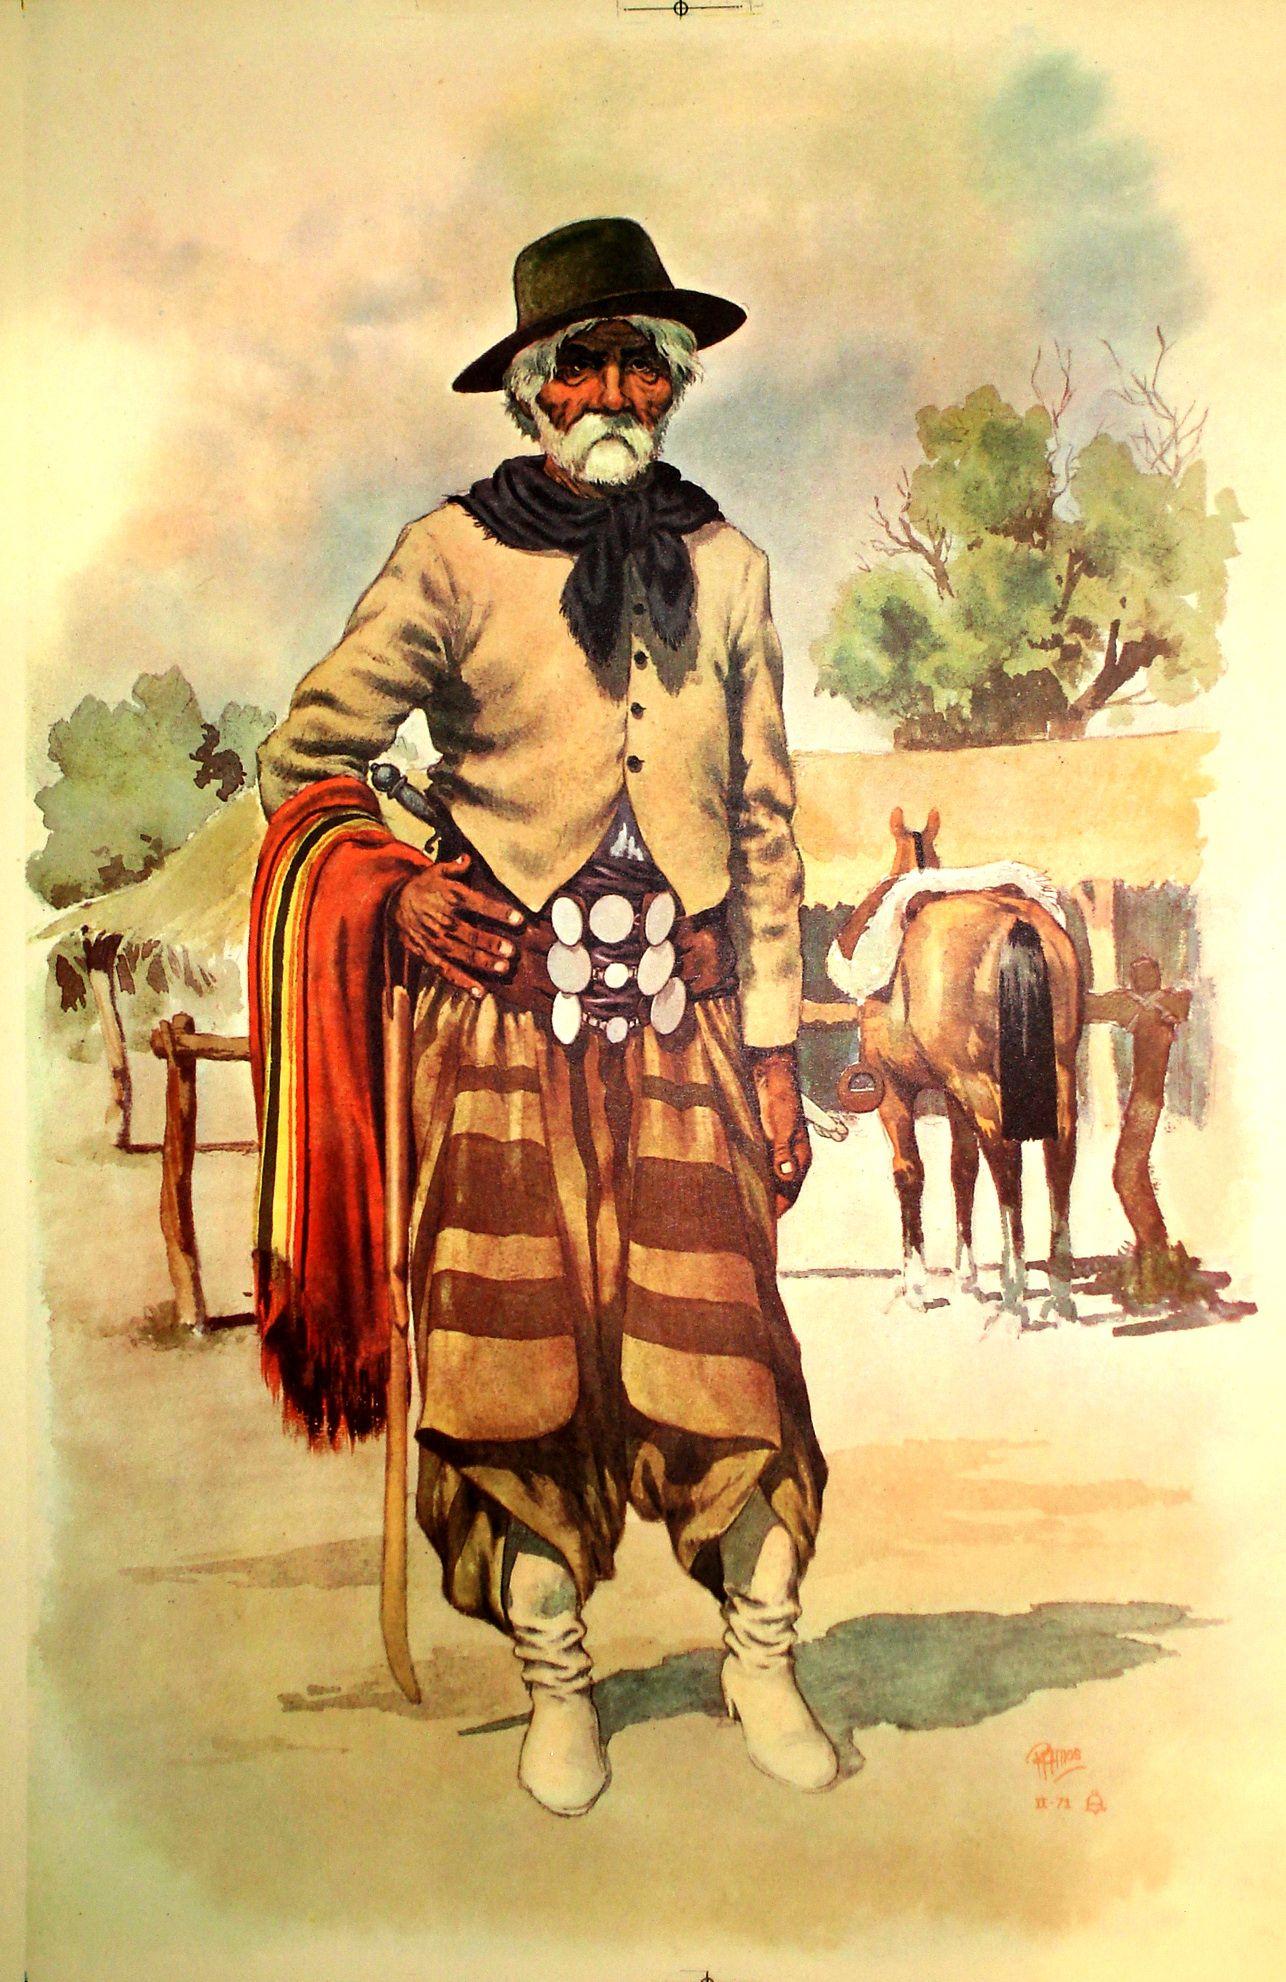 Onde Comprar Adesivo De Geladeira Em Recife ~ a gaucho is an Argentinian vagabond who herded cattle and